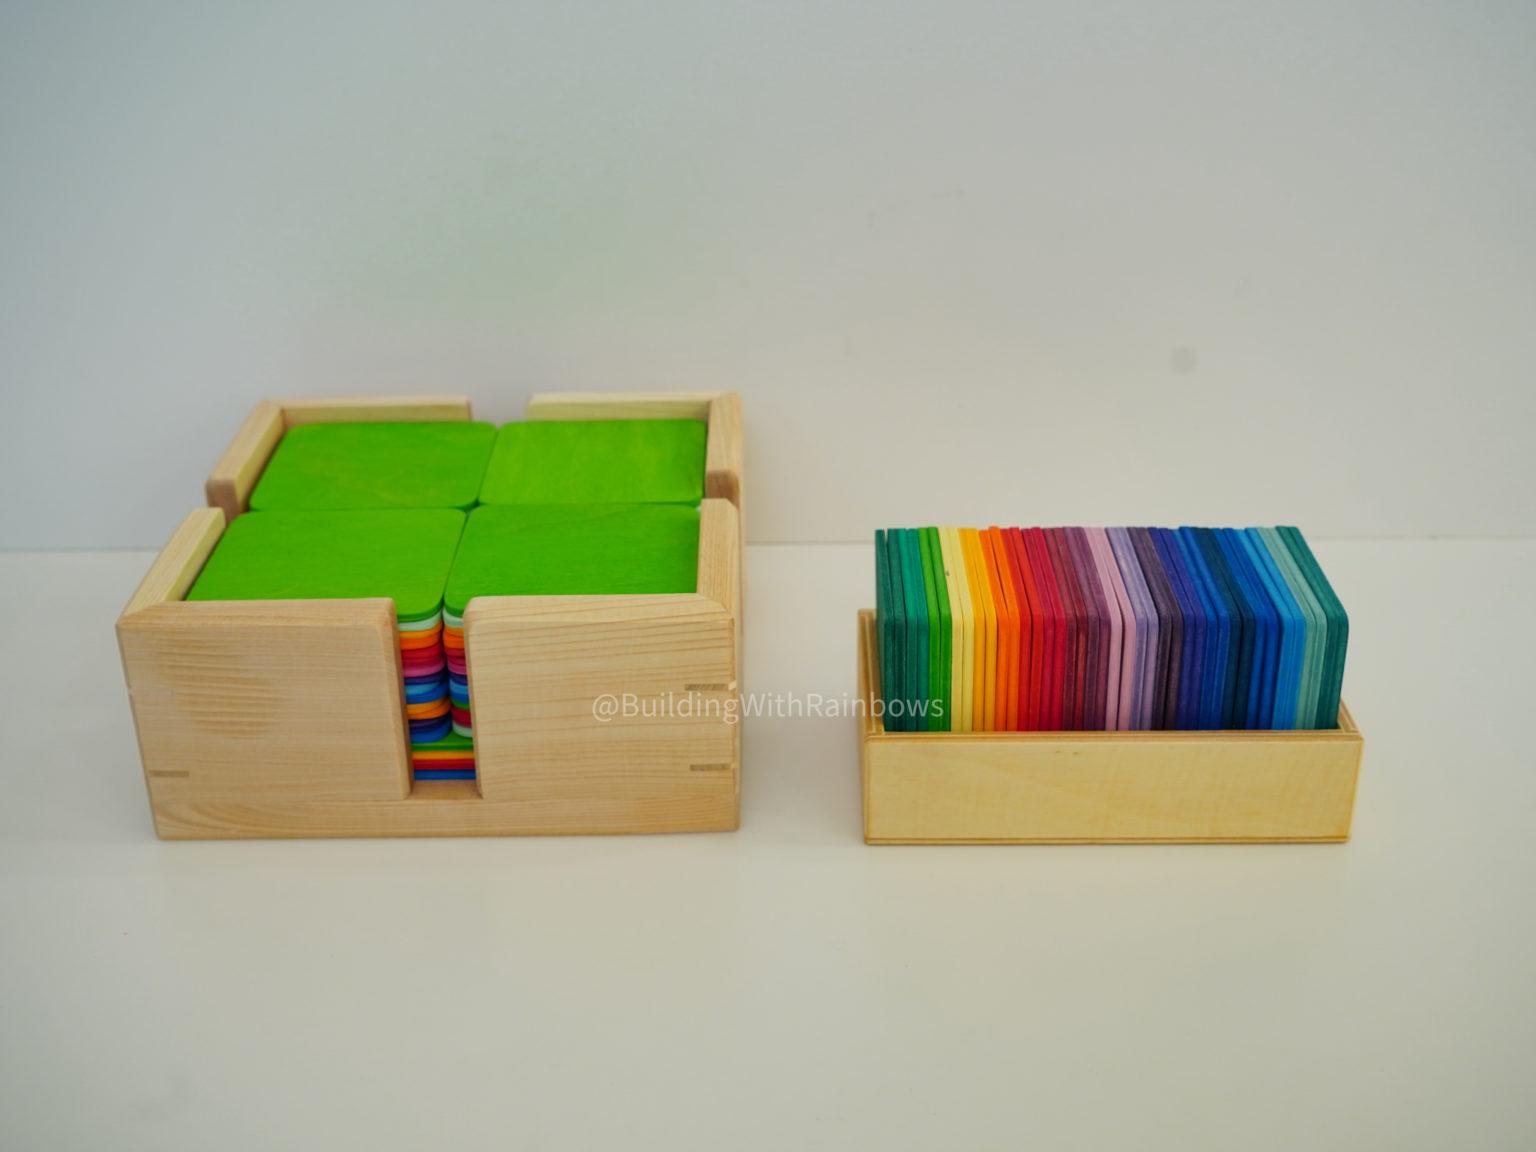 Bauspiel building tiles and Grimm's color mats side by side comparison